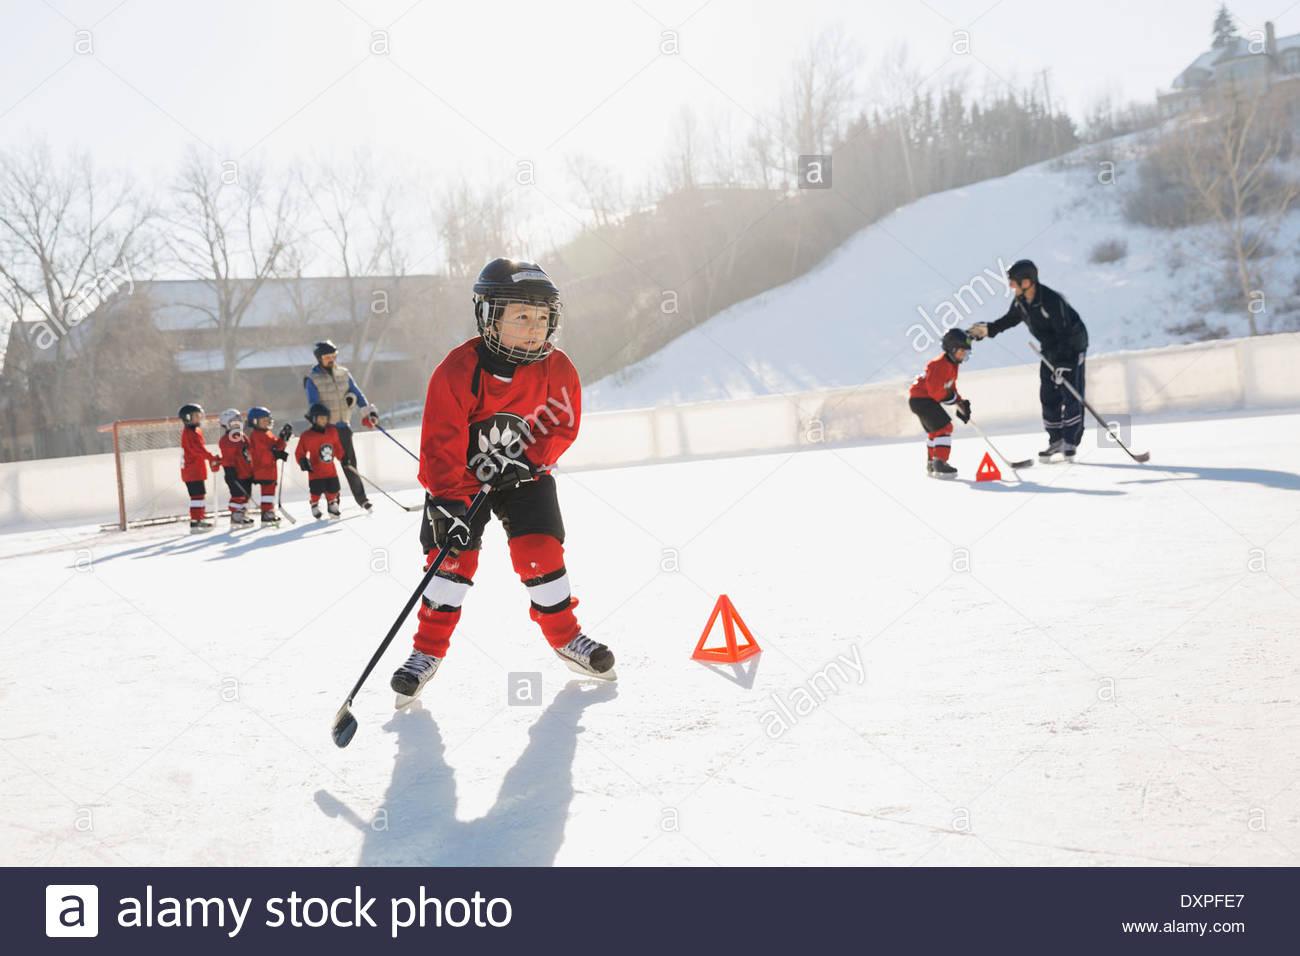 Ice hockey players training on outdoor skating rink - Stock Image